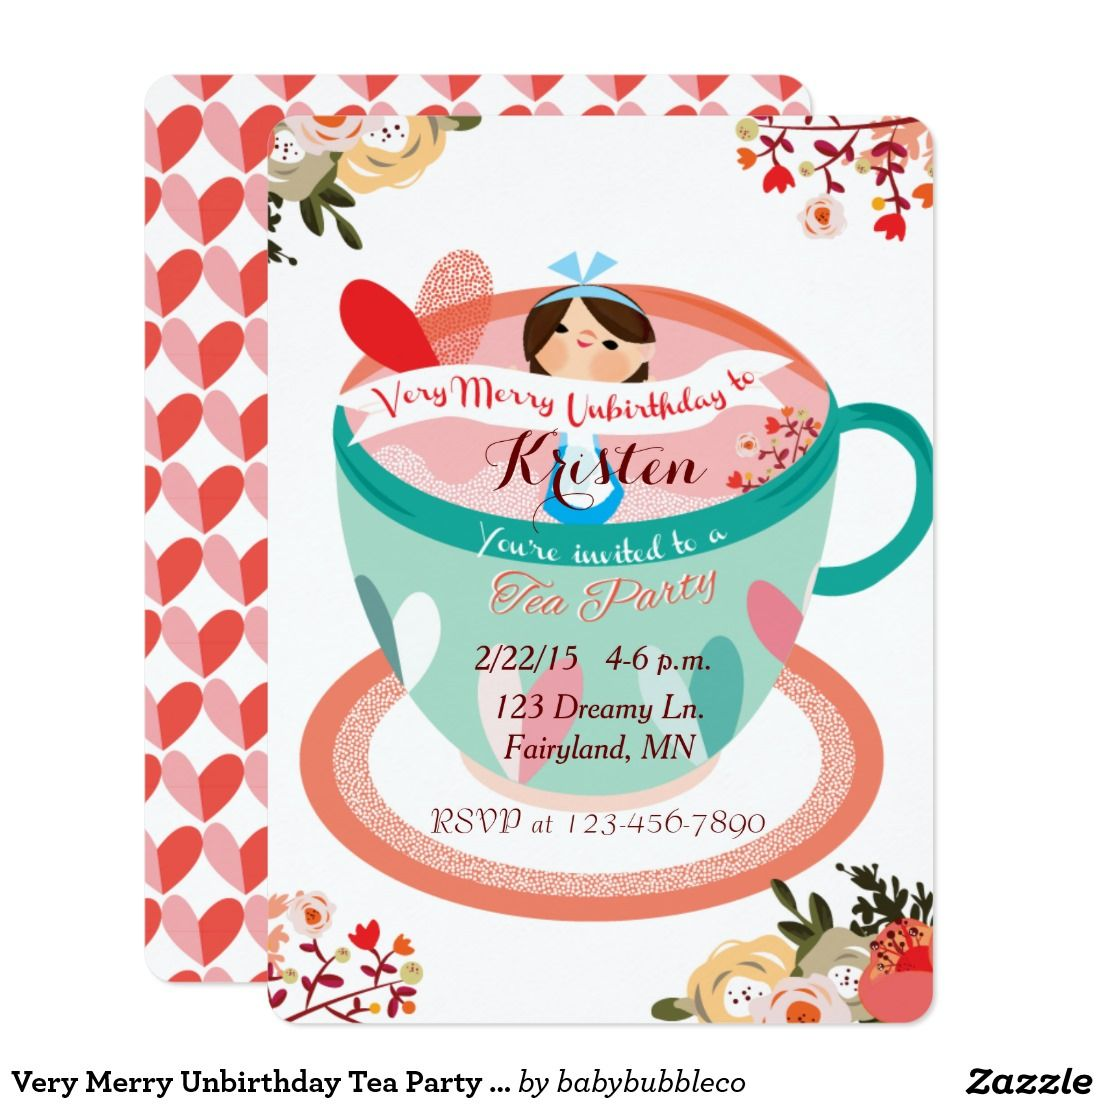 Very Merry Unbirthday Tea Party Invitation | Tea Party Invitiation ...